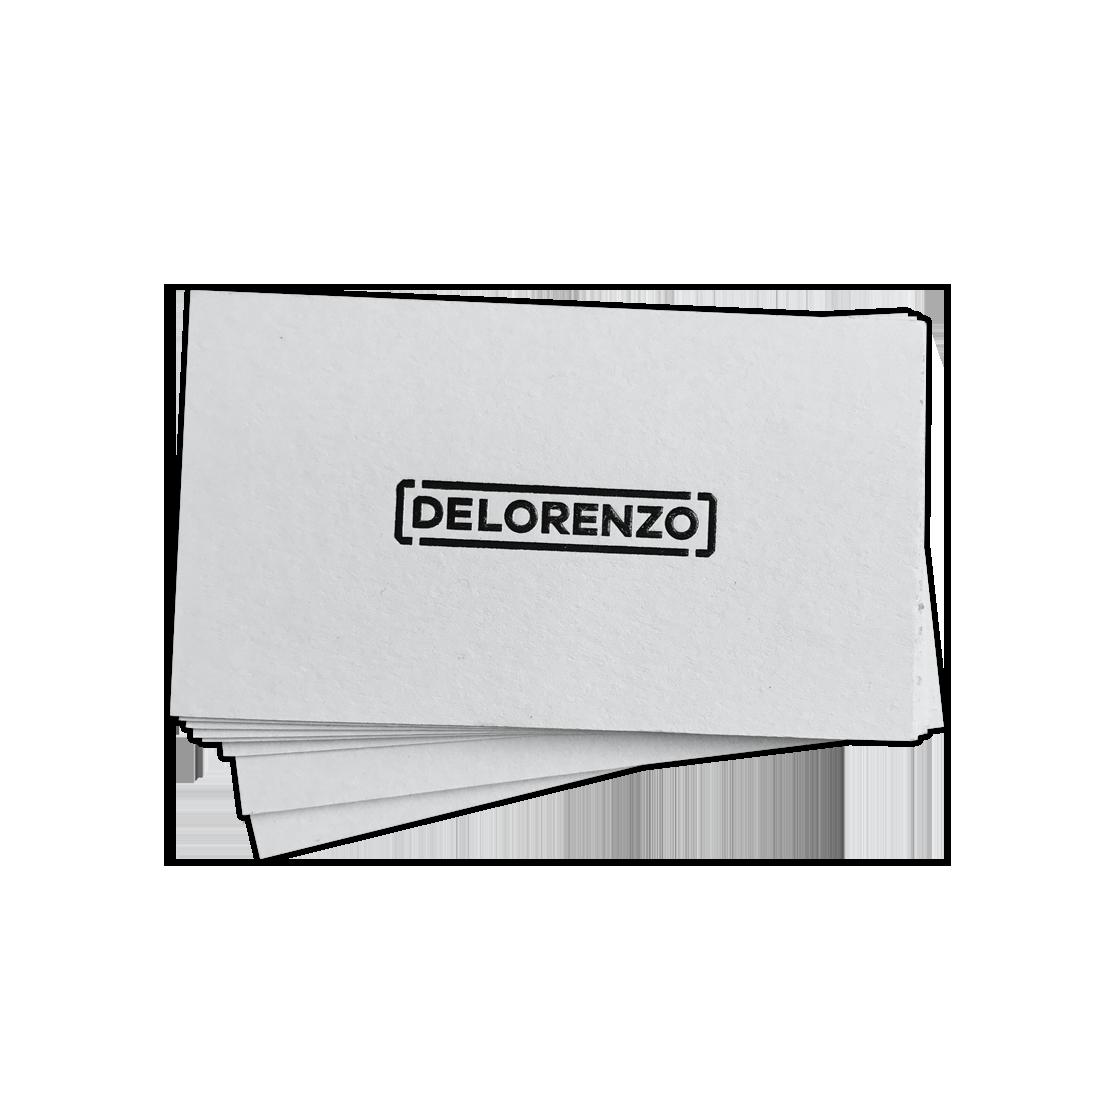 delorenzo business card design deboss with black foil